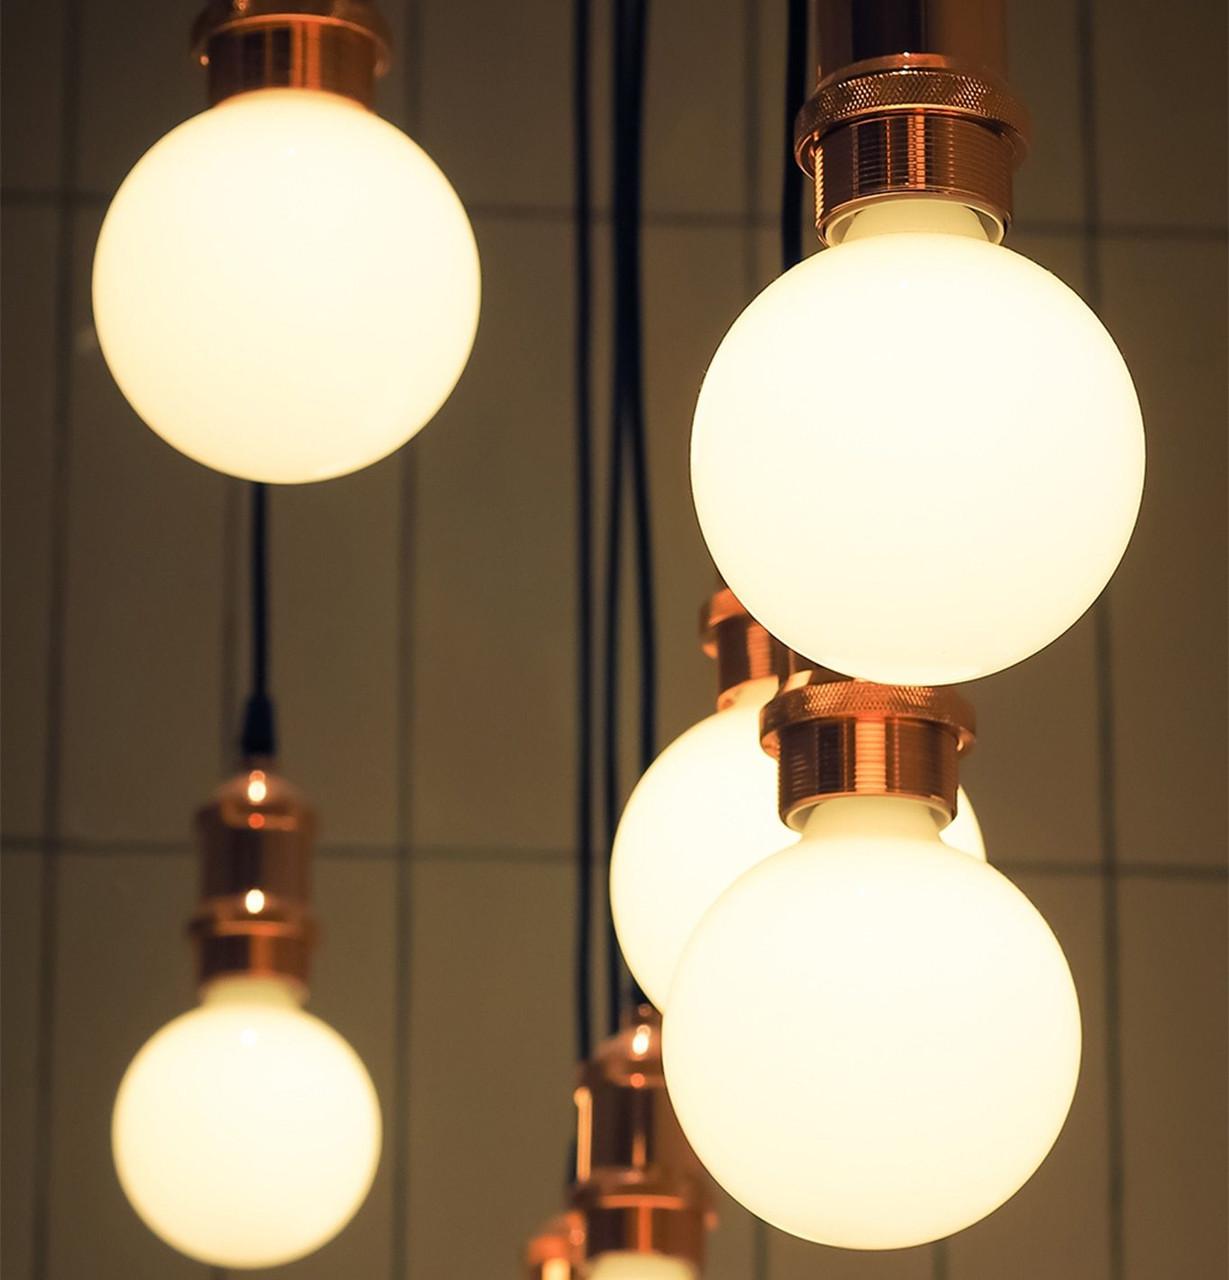 LED Dimmable G95 ES Light Bulbs